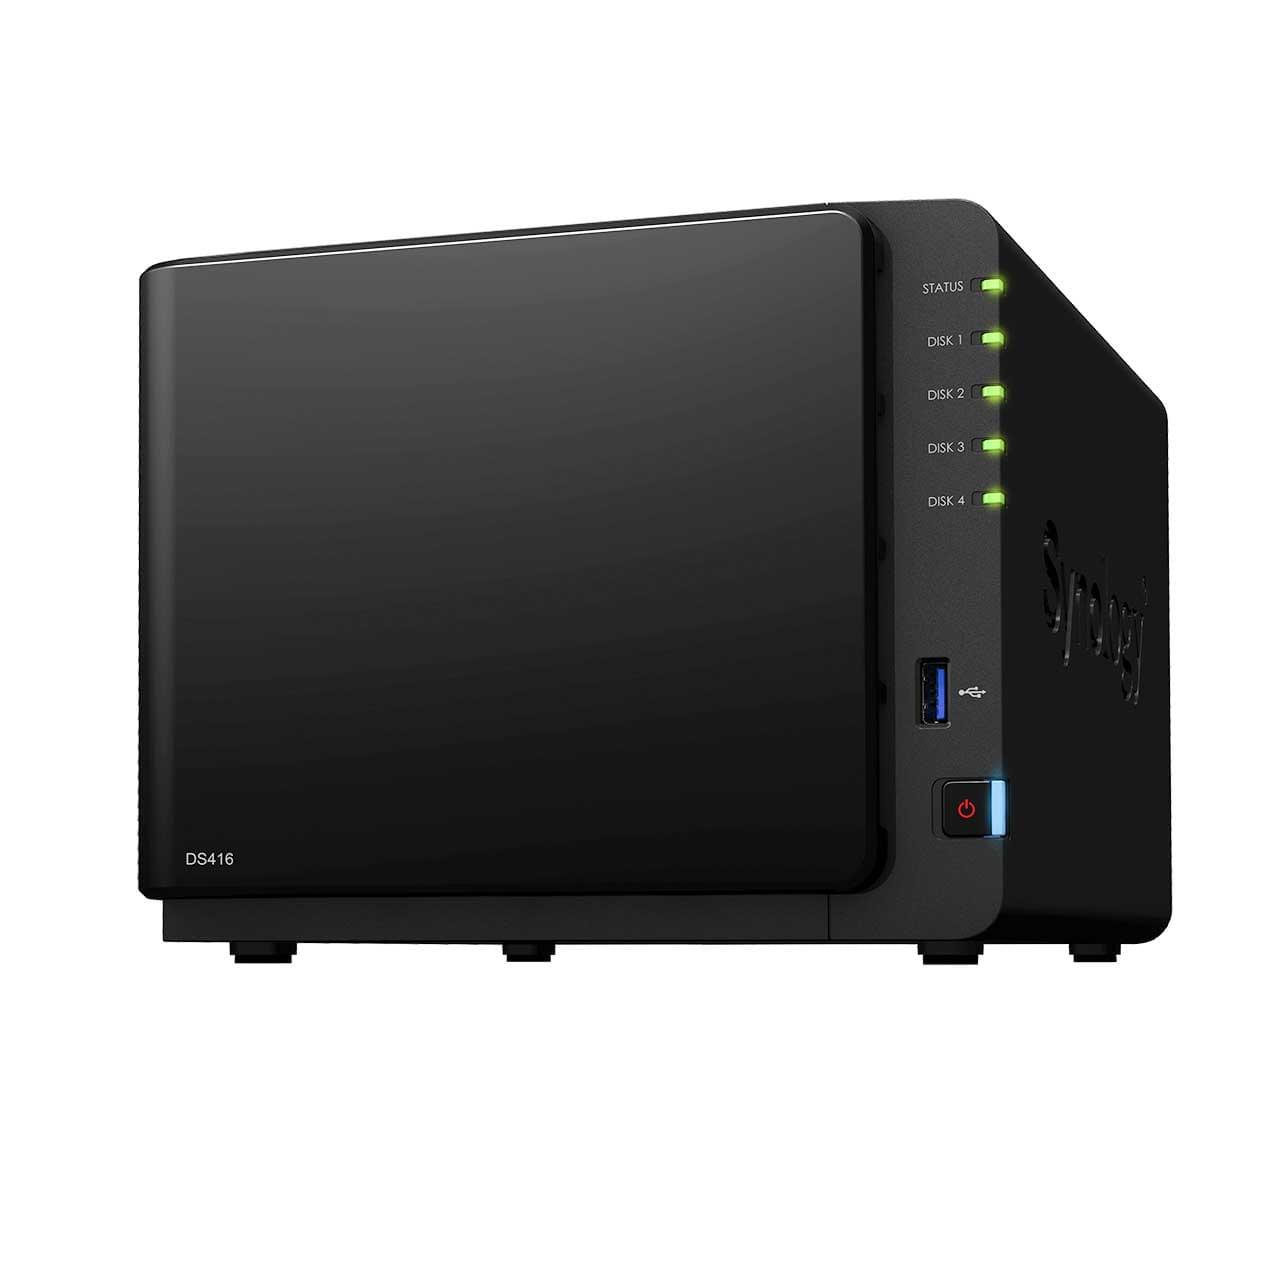 Synology DS416 - 4 HDD - Serveur NAS Synology - Cybertek.fr - 0